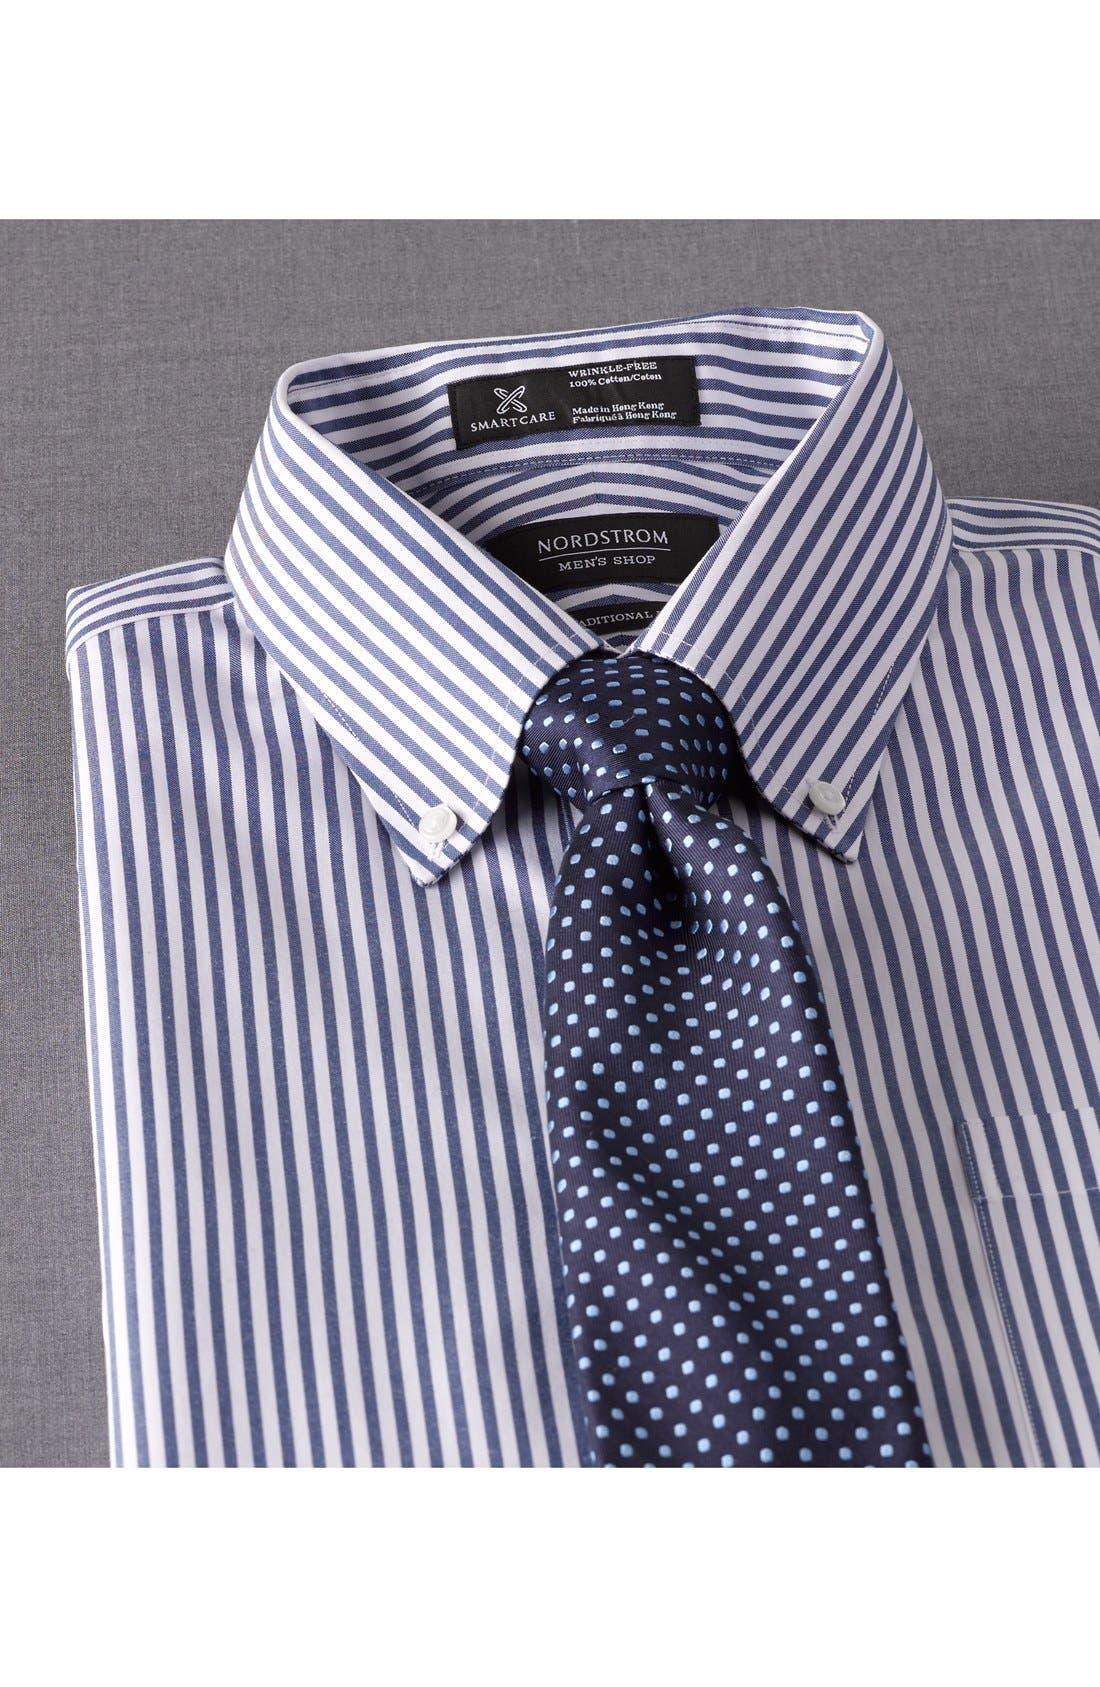 NORDSTROM MEN'S SHOP,                             Smartcare<sup>™</sup> Traditional Fit Stripe Dress Shirt,                             Alternate thumbnail 3, color,                             020